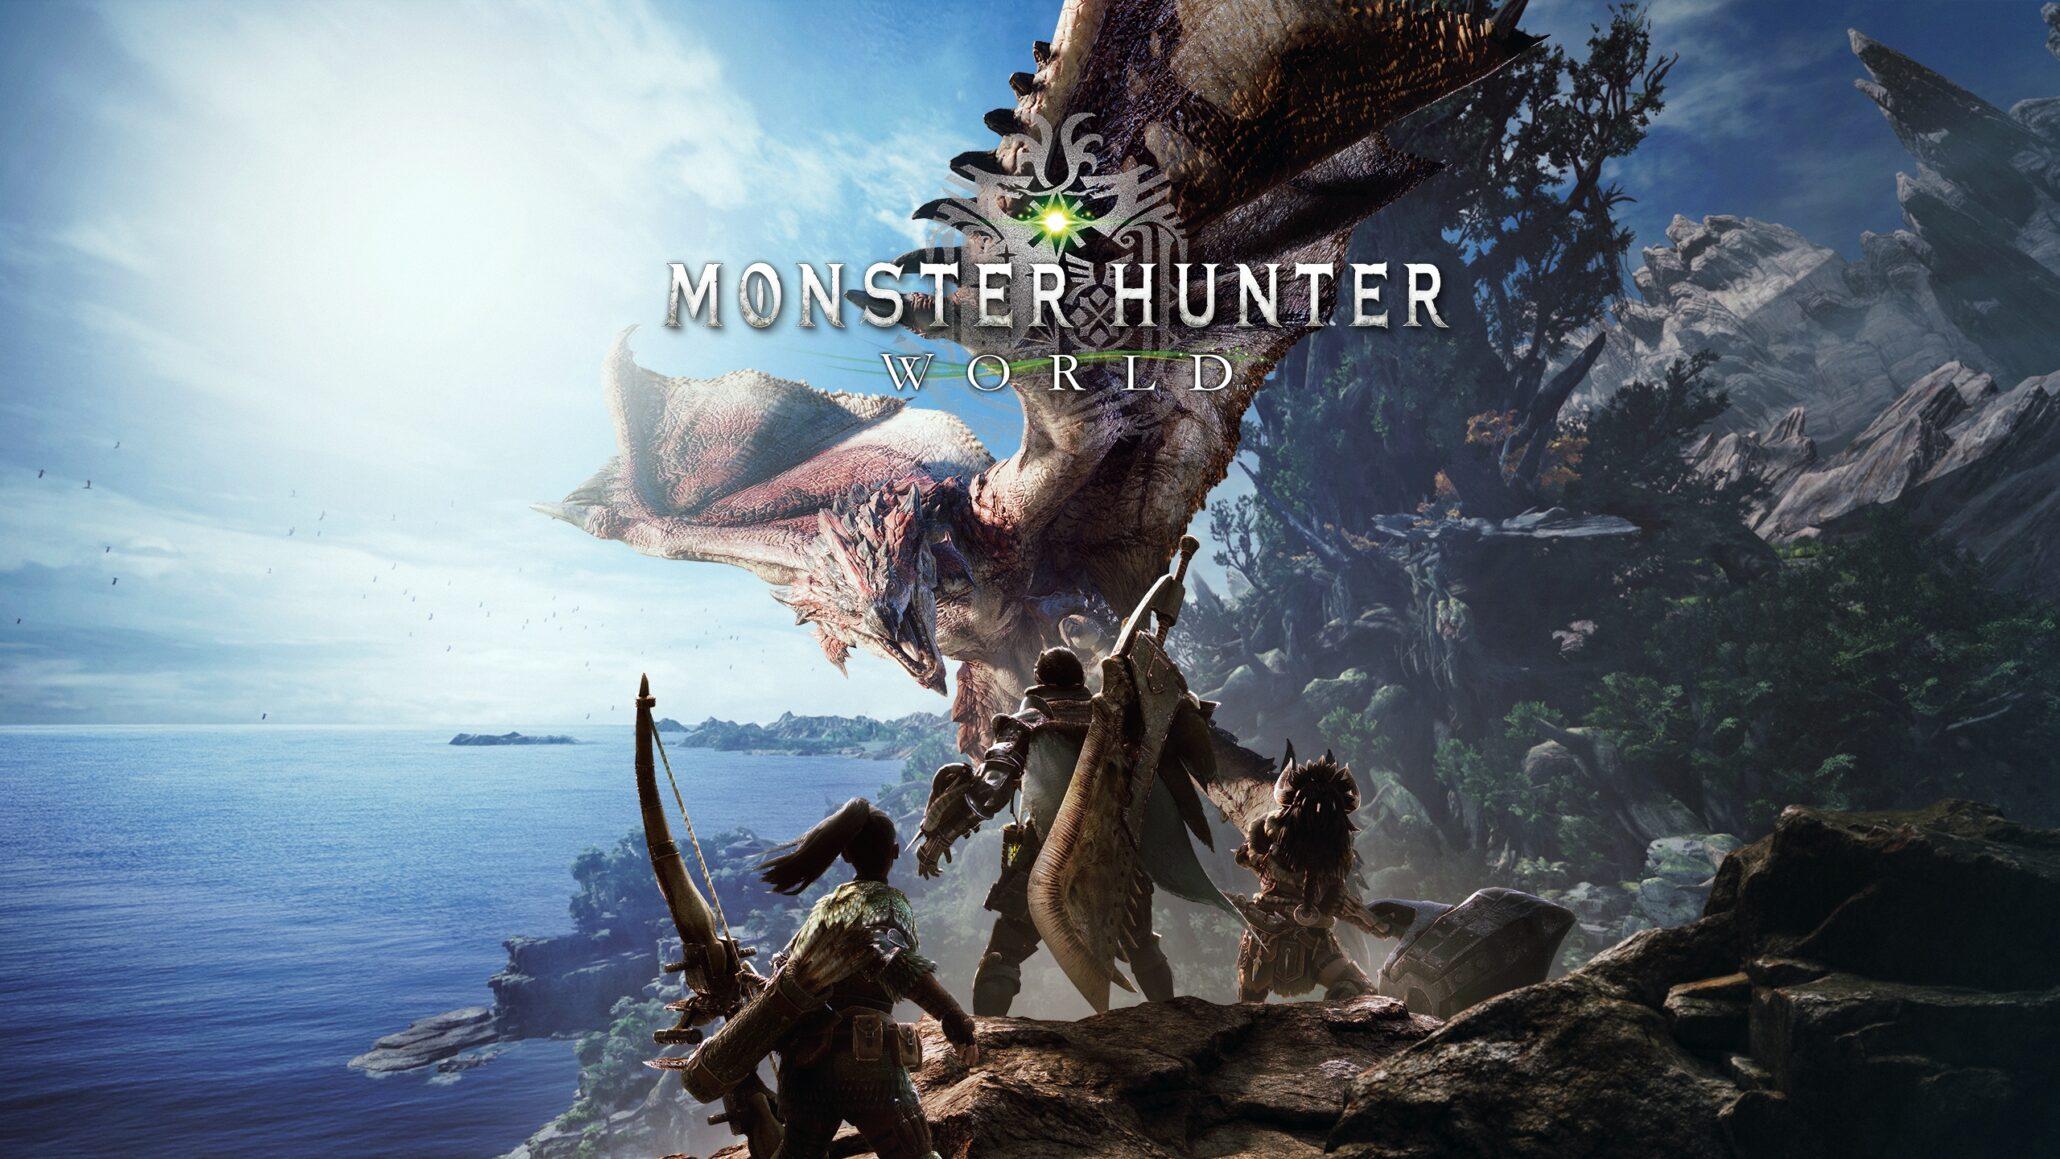 Monster Hunter World Shipments And Digital Sales Surpass 14